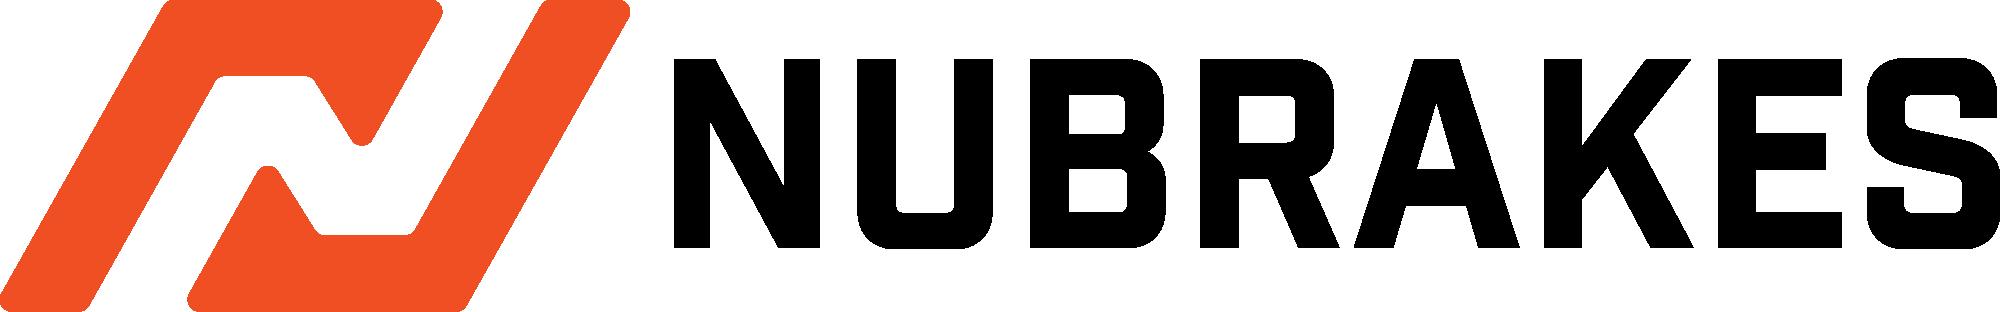 NuBrakes logo